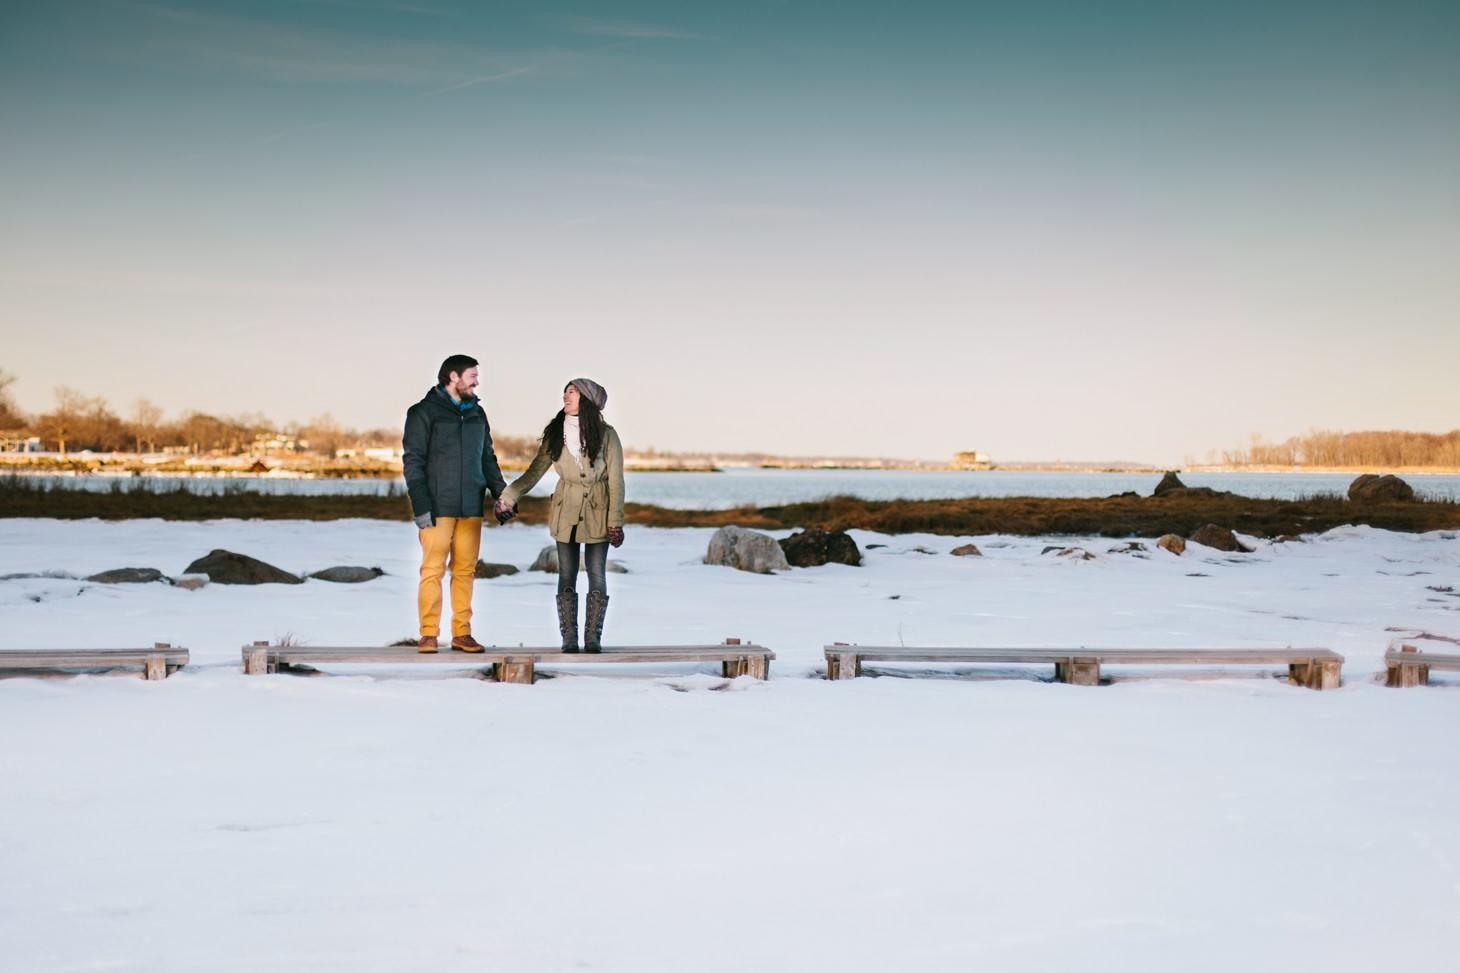 042-nyc-wedding-photographer-orchard-beach-bronx-engagement-winter-smitten-chickens.jpg